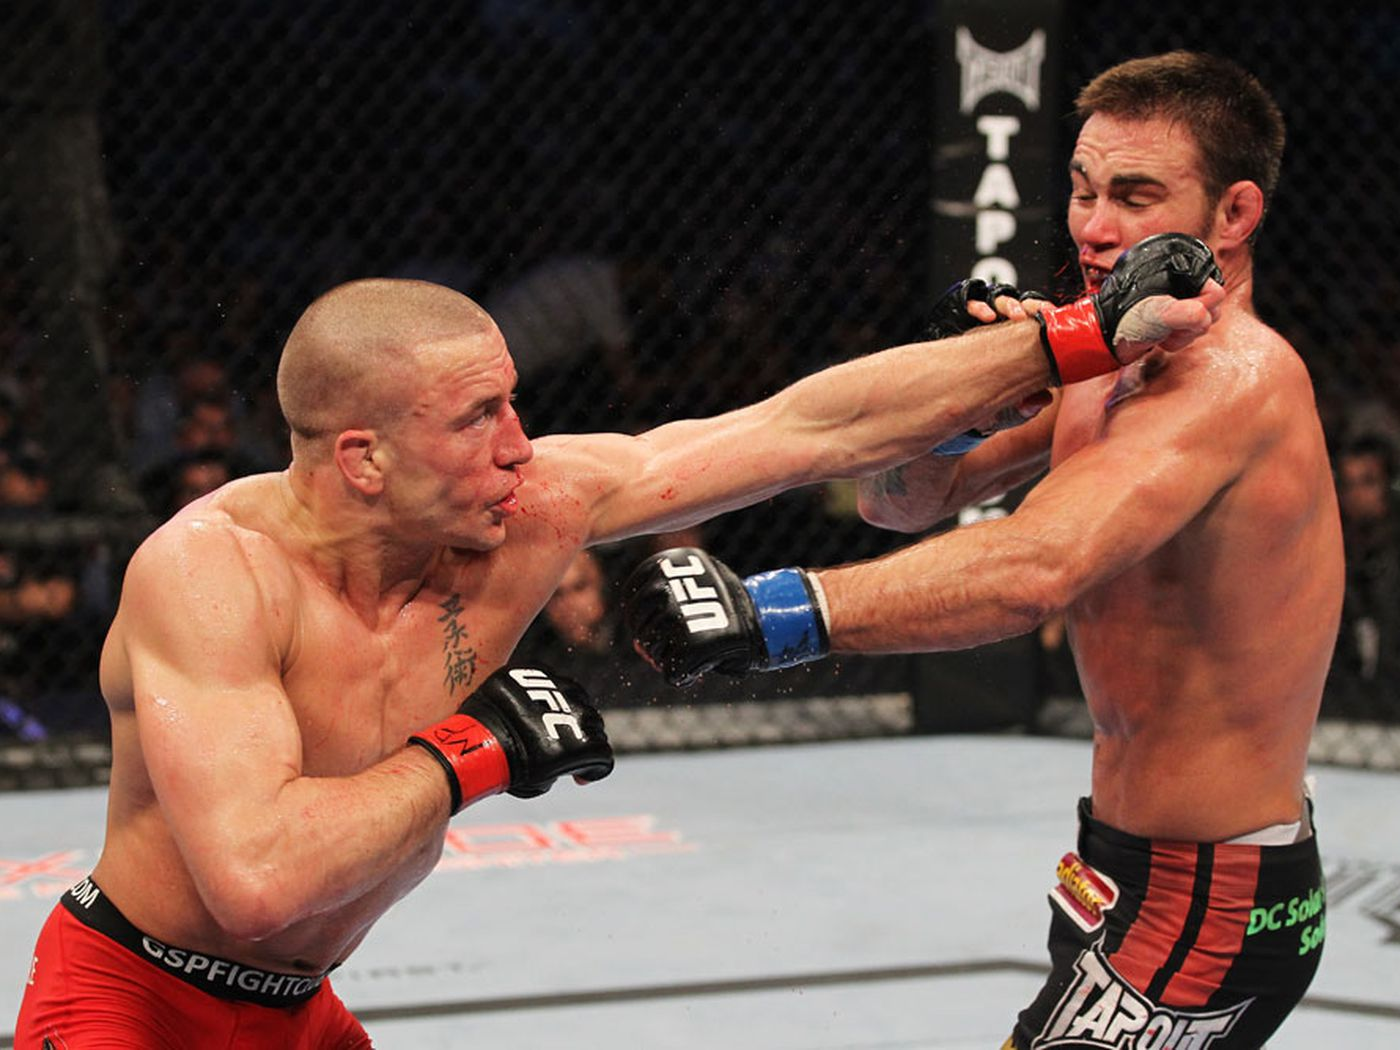 UFC 129: St. Pierre Vs. Shields Coverage Round-Up - SBNation.com